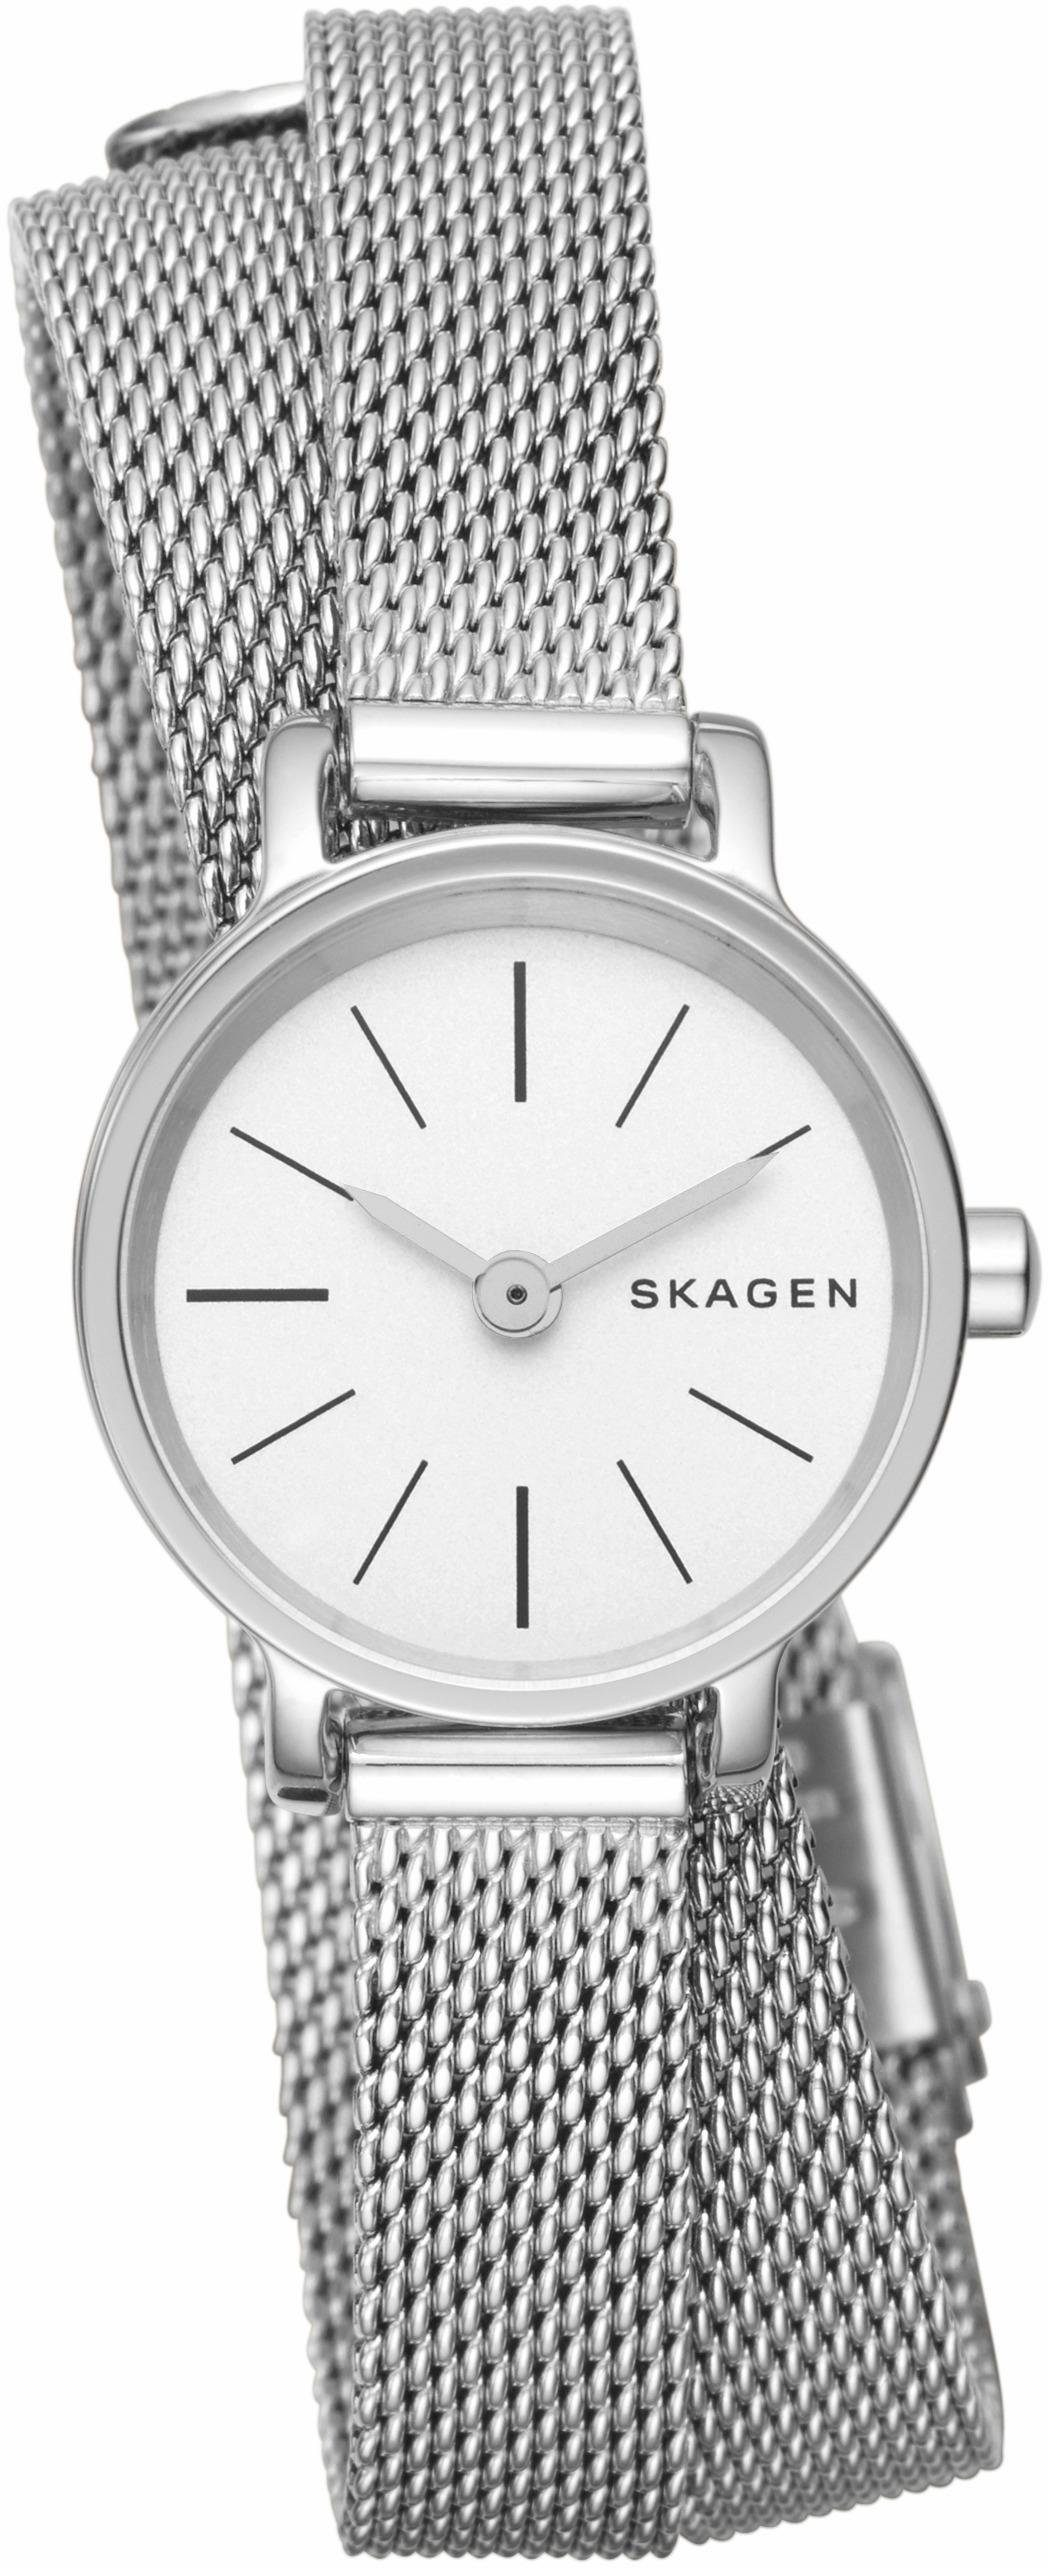 Skagen Quarzuhr »HAGEN MINI, SKW2601«